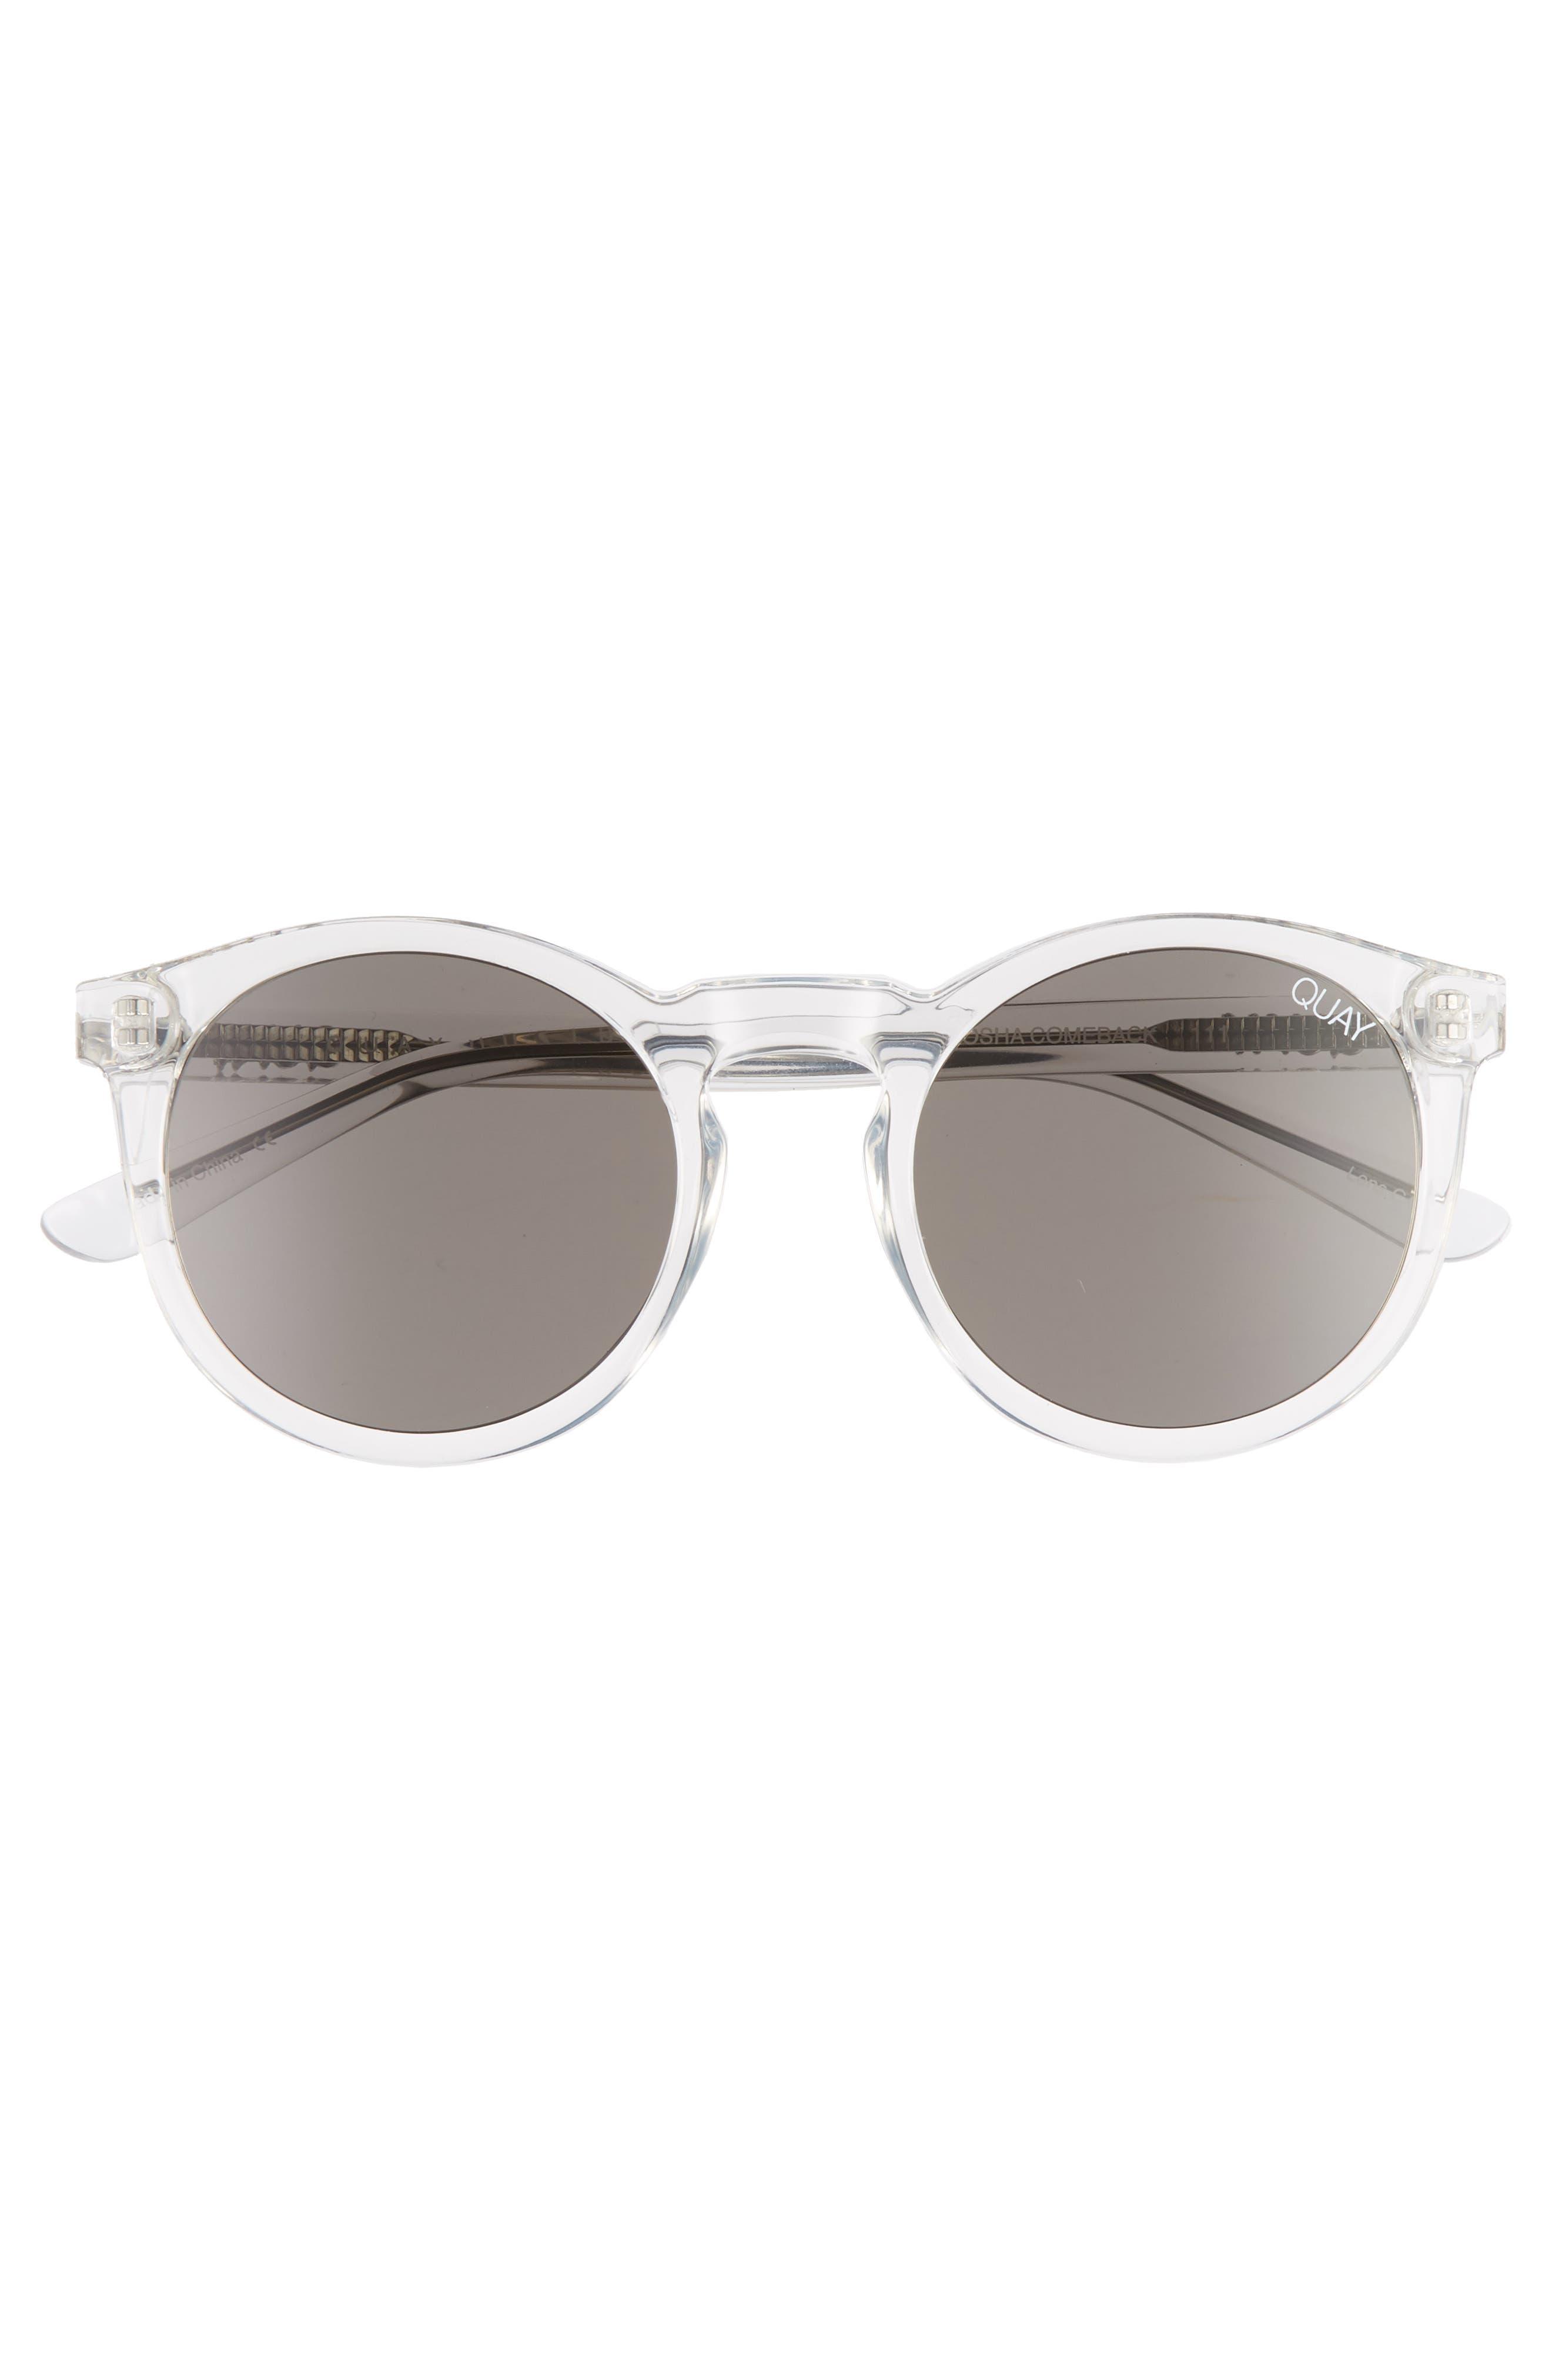 Kosha 49mm Round Sunglasses,                             Alternate thumbnail 3, color,                             100